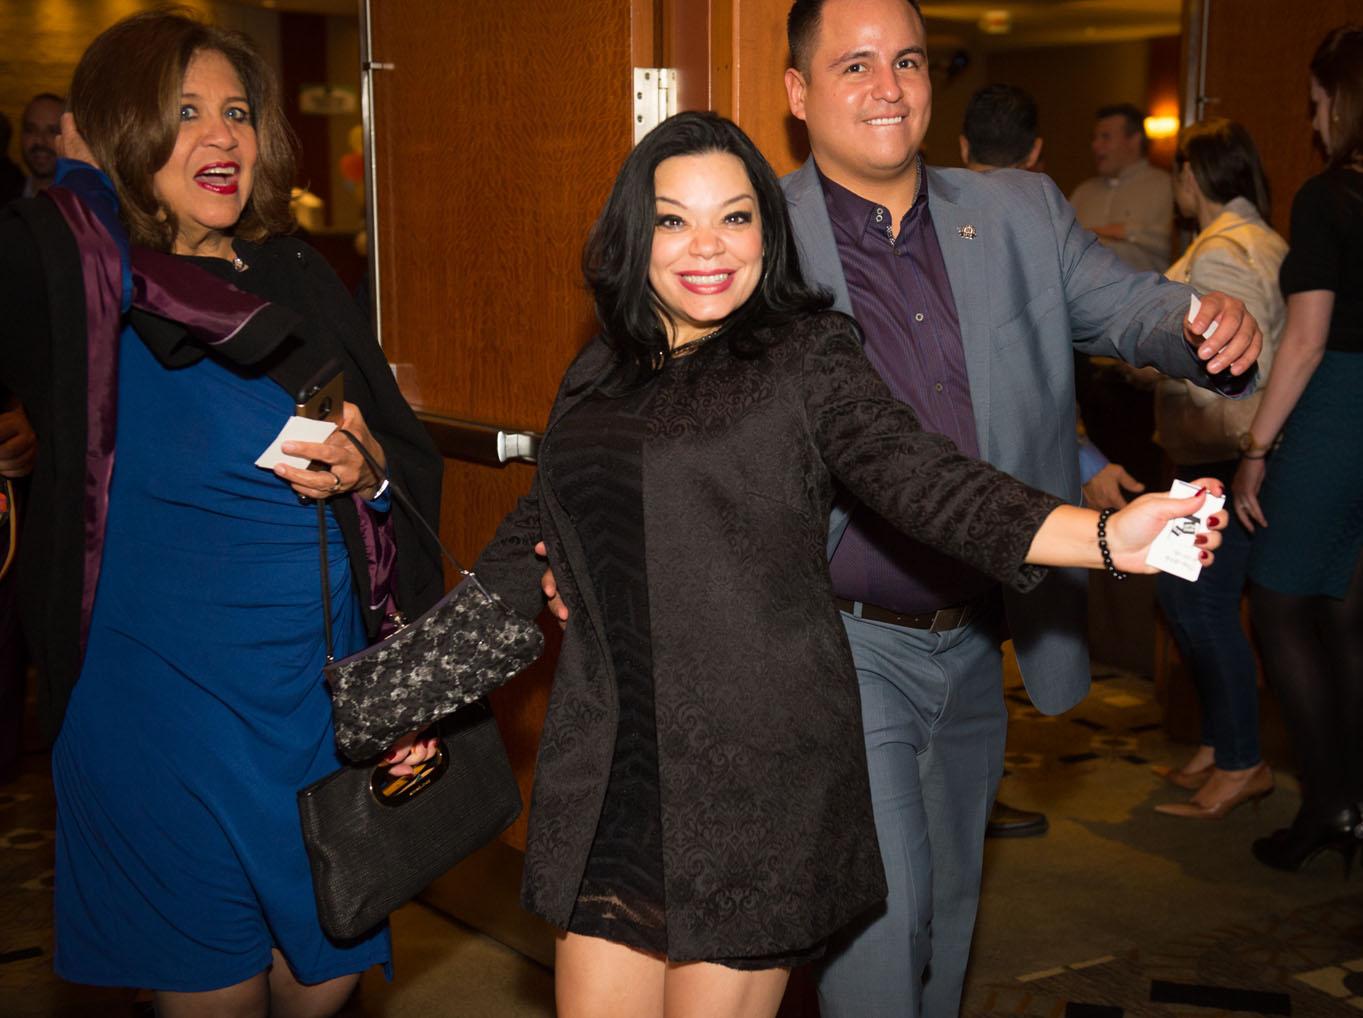 2015-12-09 ReMax Corpoarte Event - The Borgata - Atlantic City NJ - Photo Sesh - 2015-5133.jpg